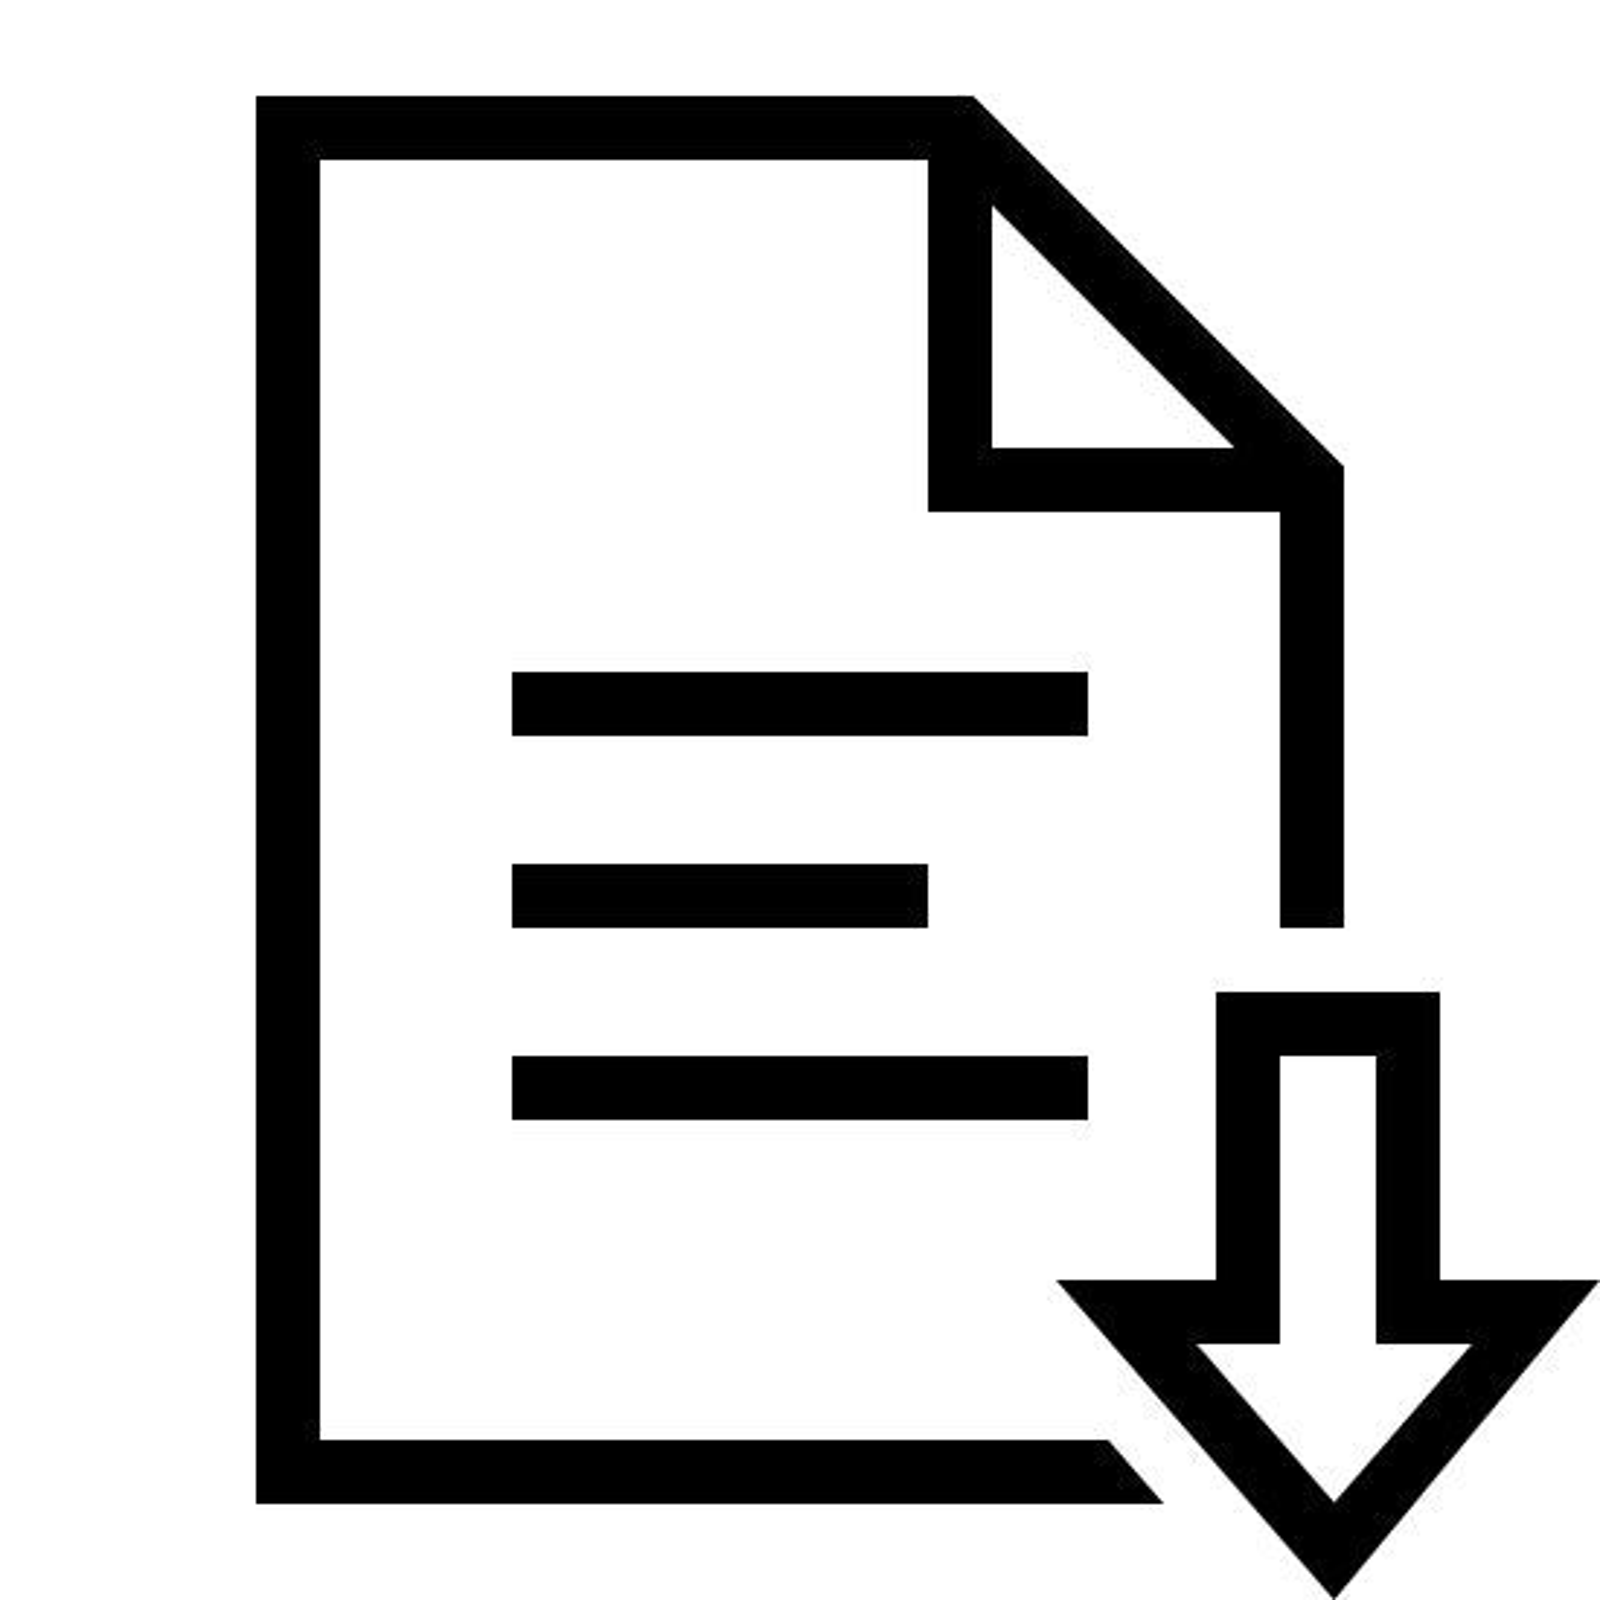 Otwórz dokument icon